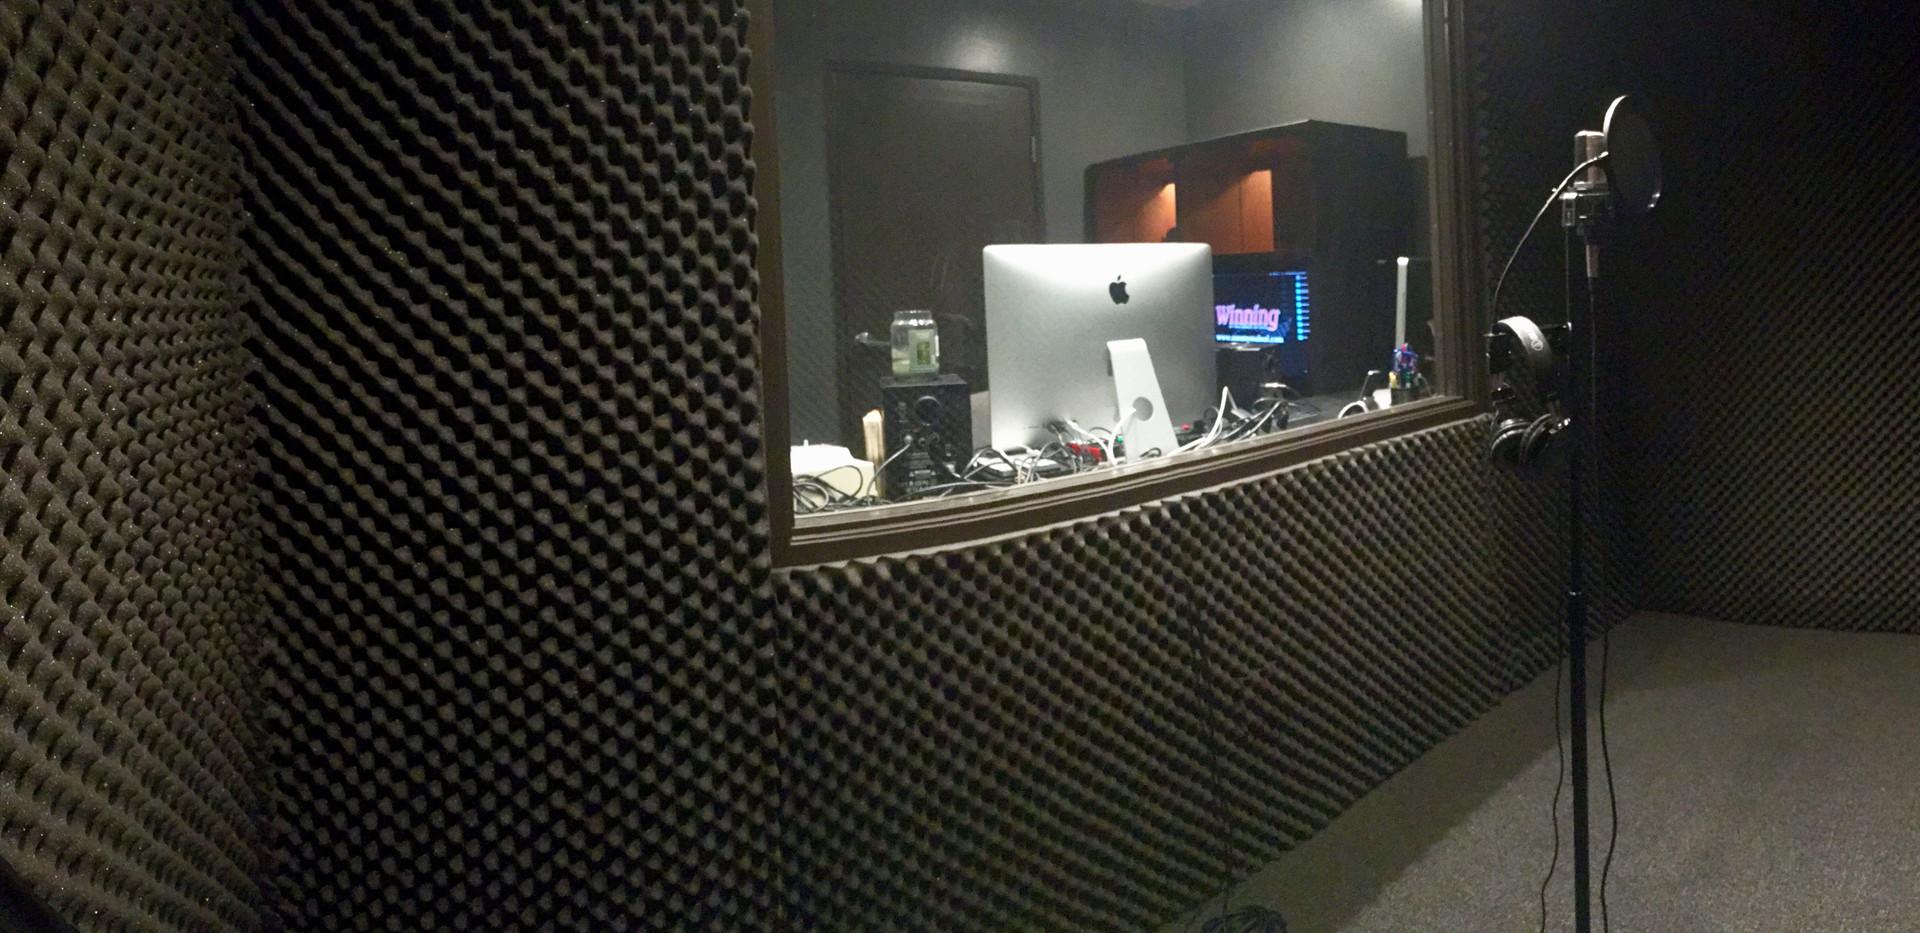 Isolation Recording Booth.jpg